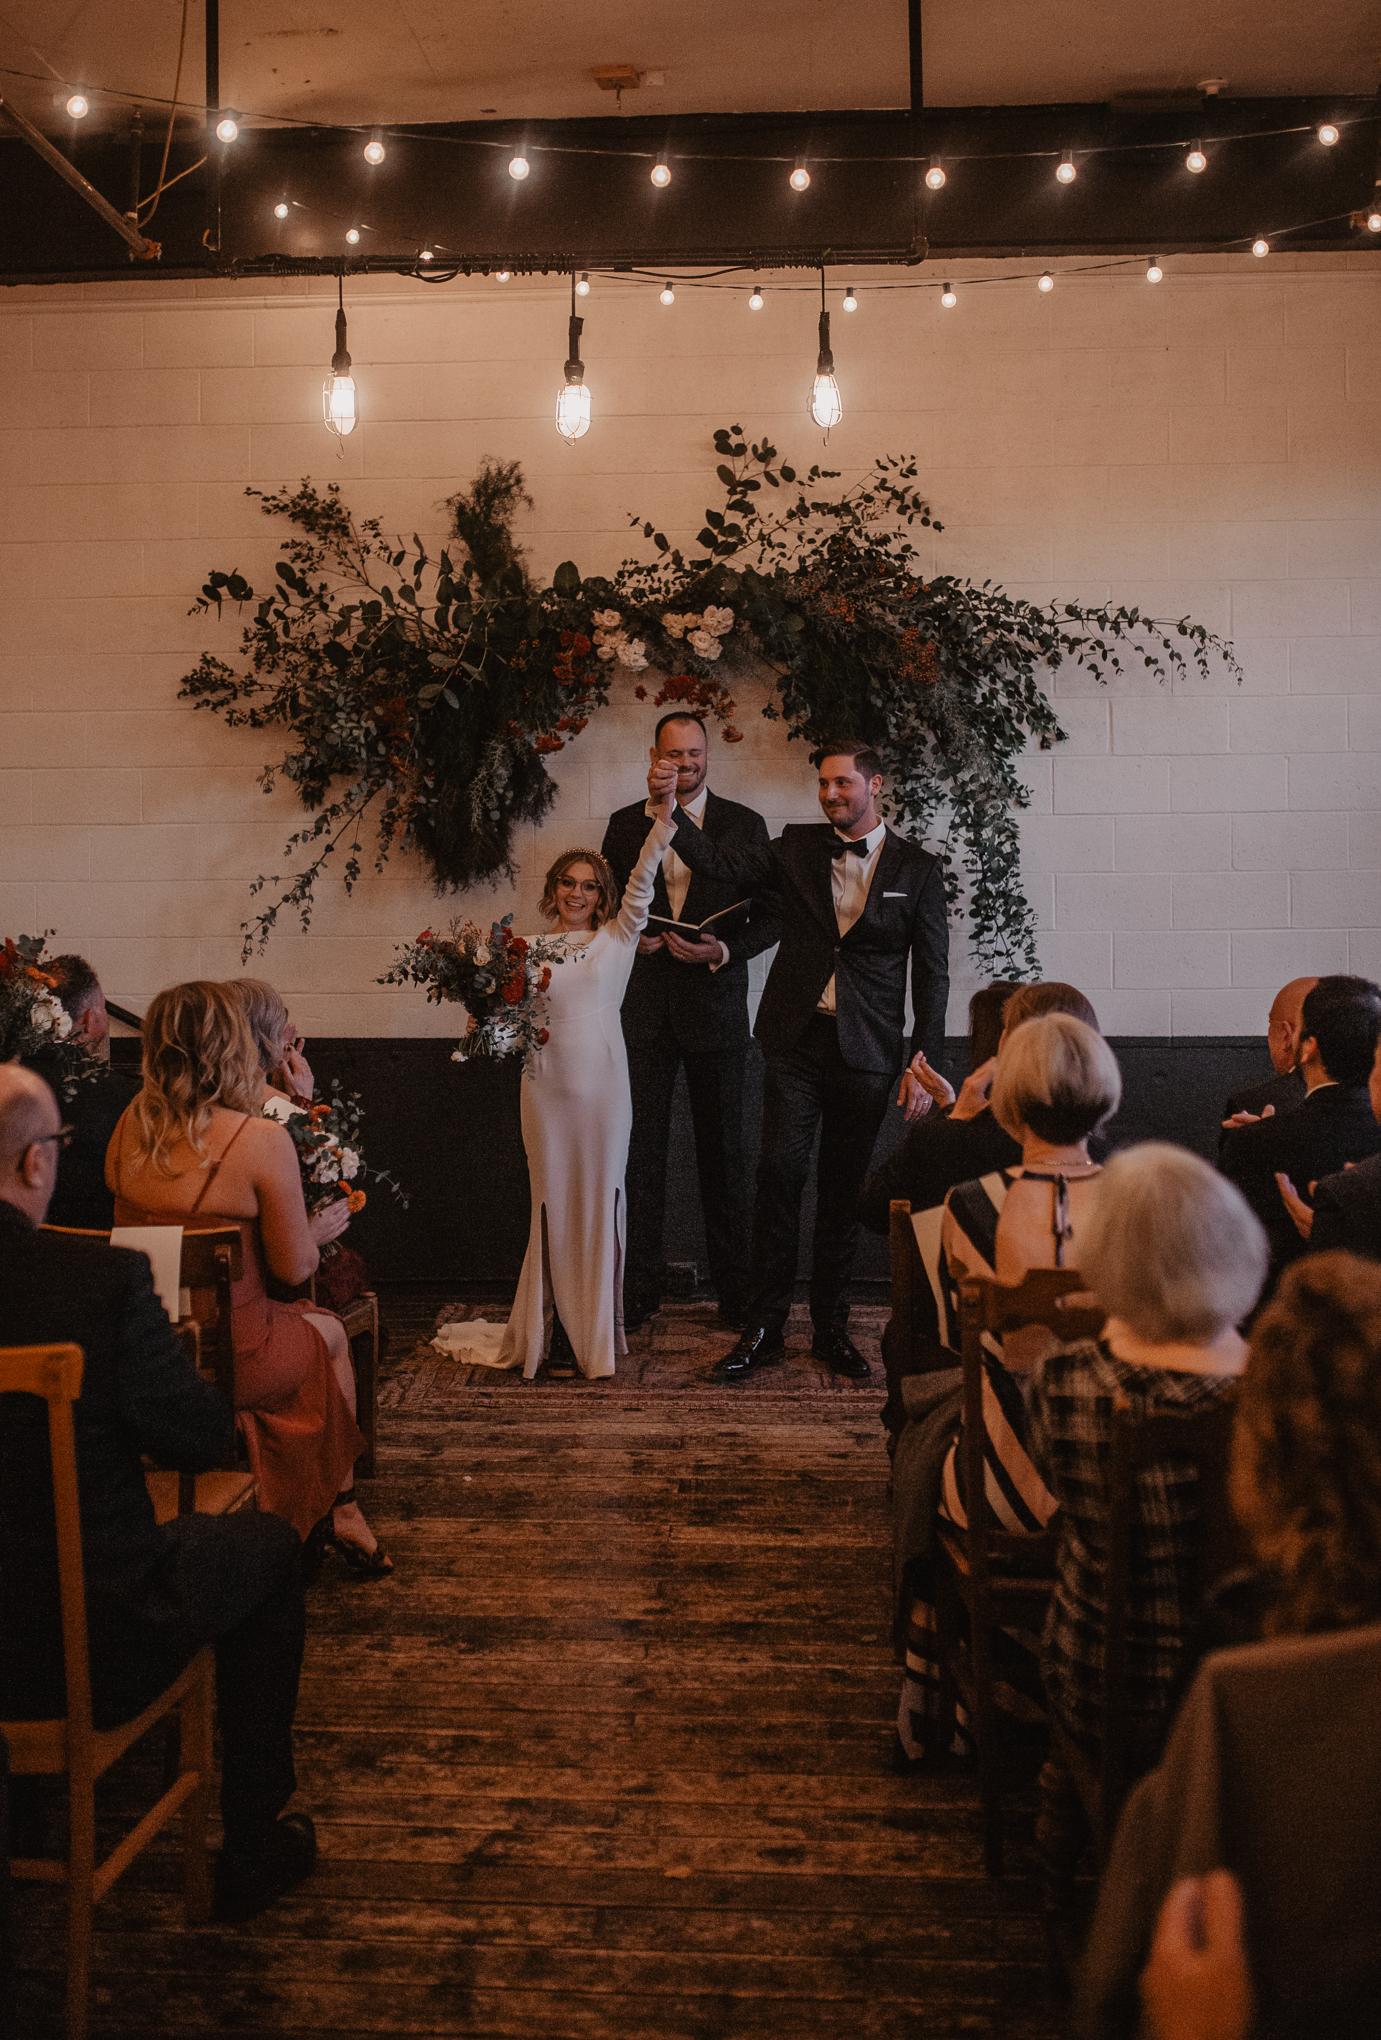 union-pine-urban-portland-trendy-wedding-461.jpg